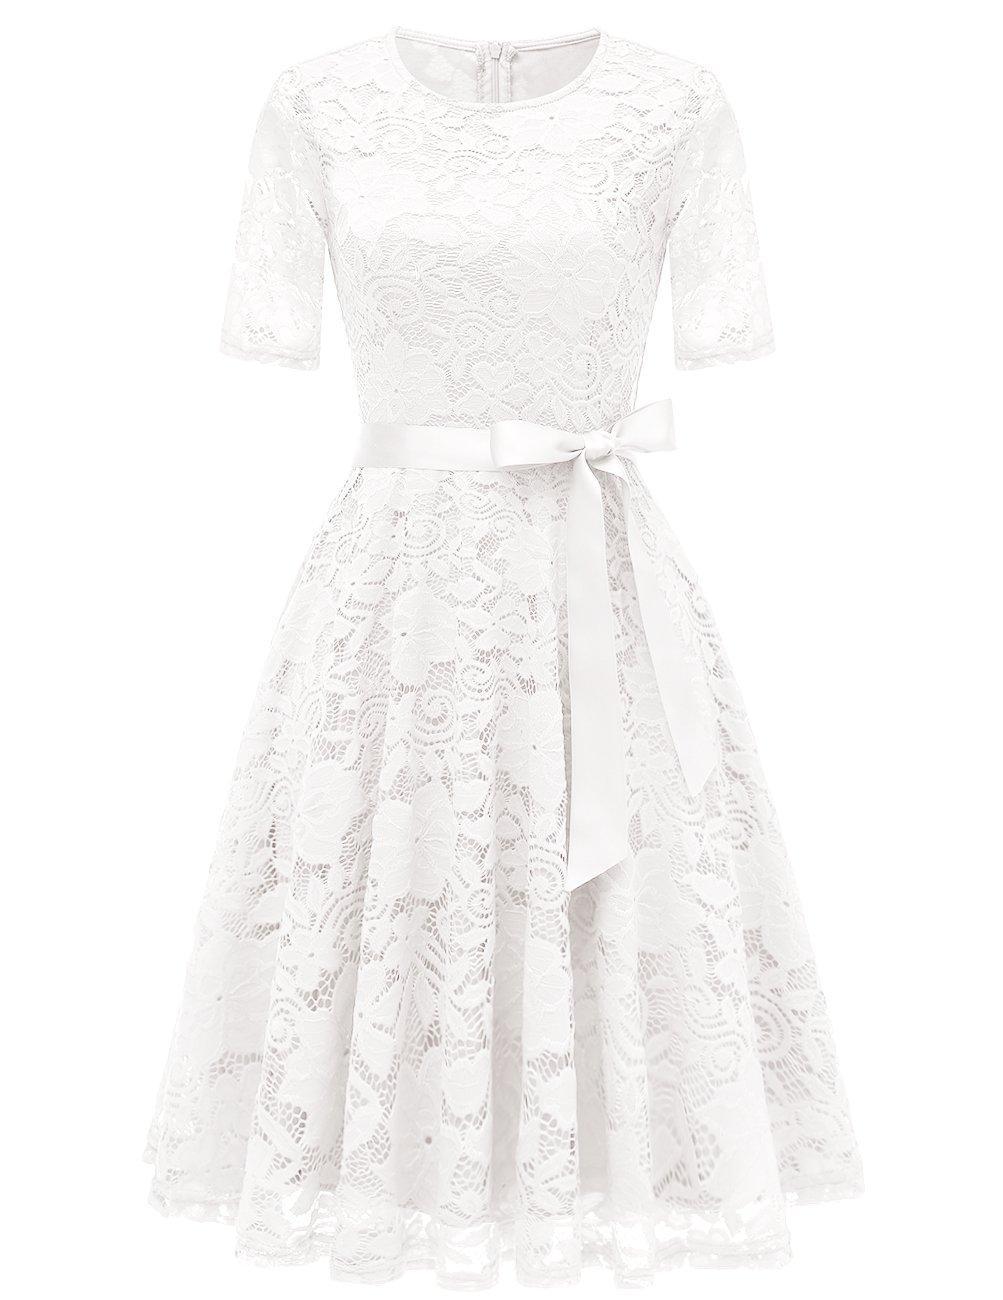 DRESSTELLS Short Bridesmaid Scoop Floral Lace Dress Cocktail Formal Party Dress White L by DRESSTELLS